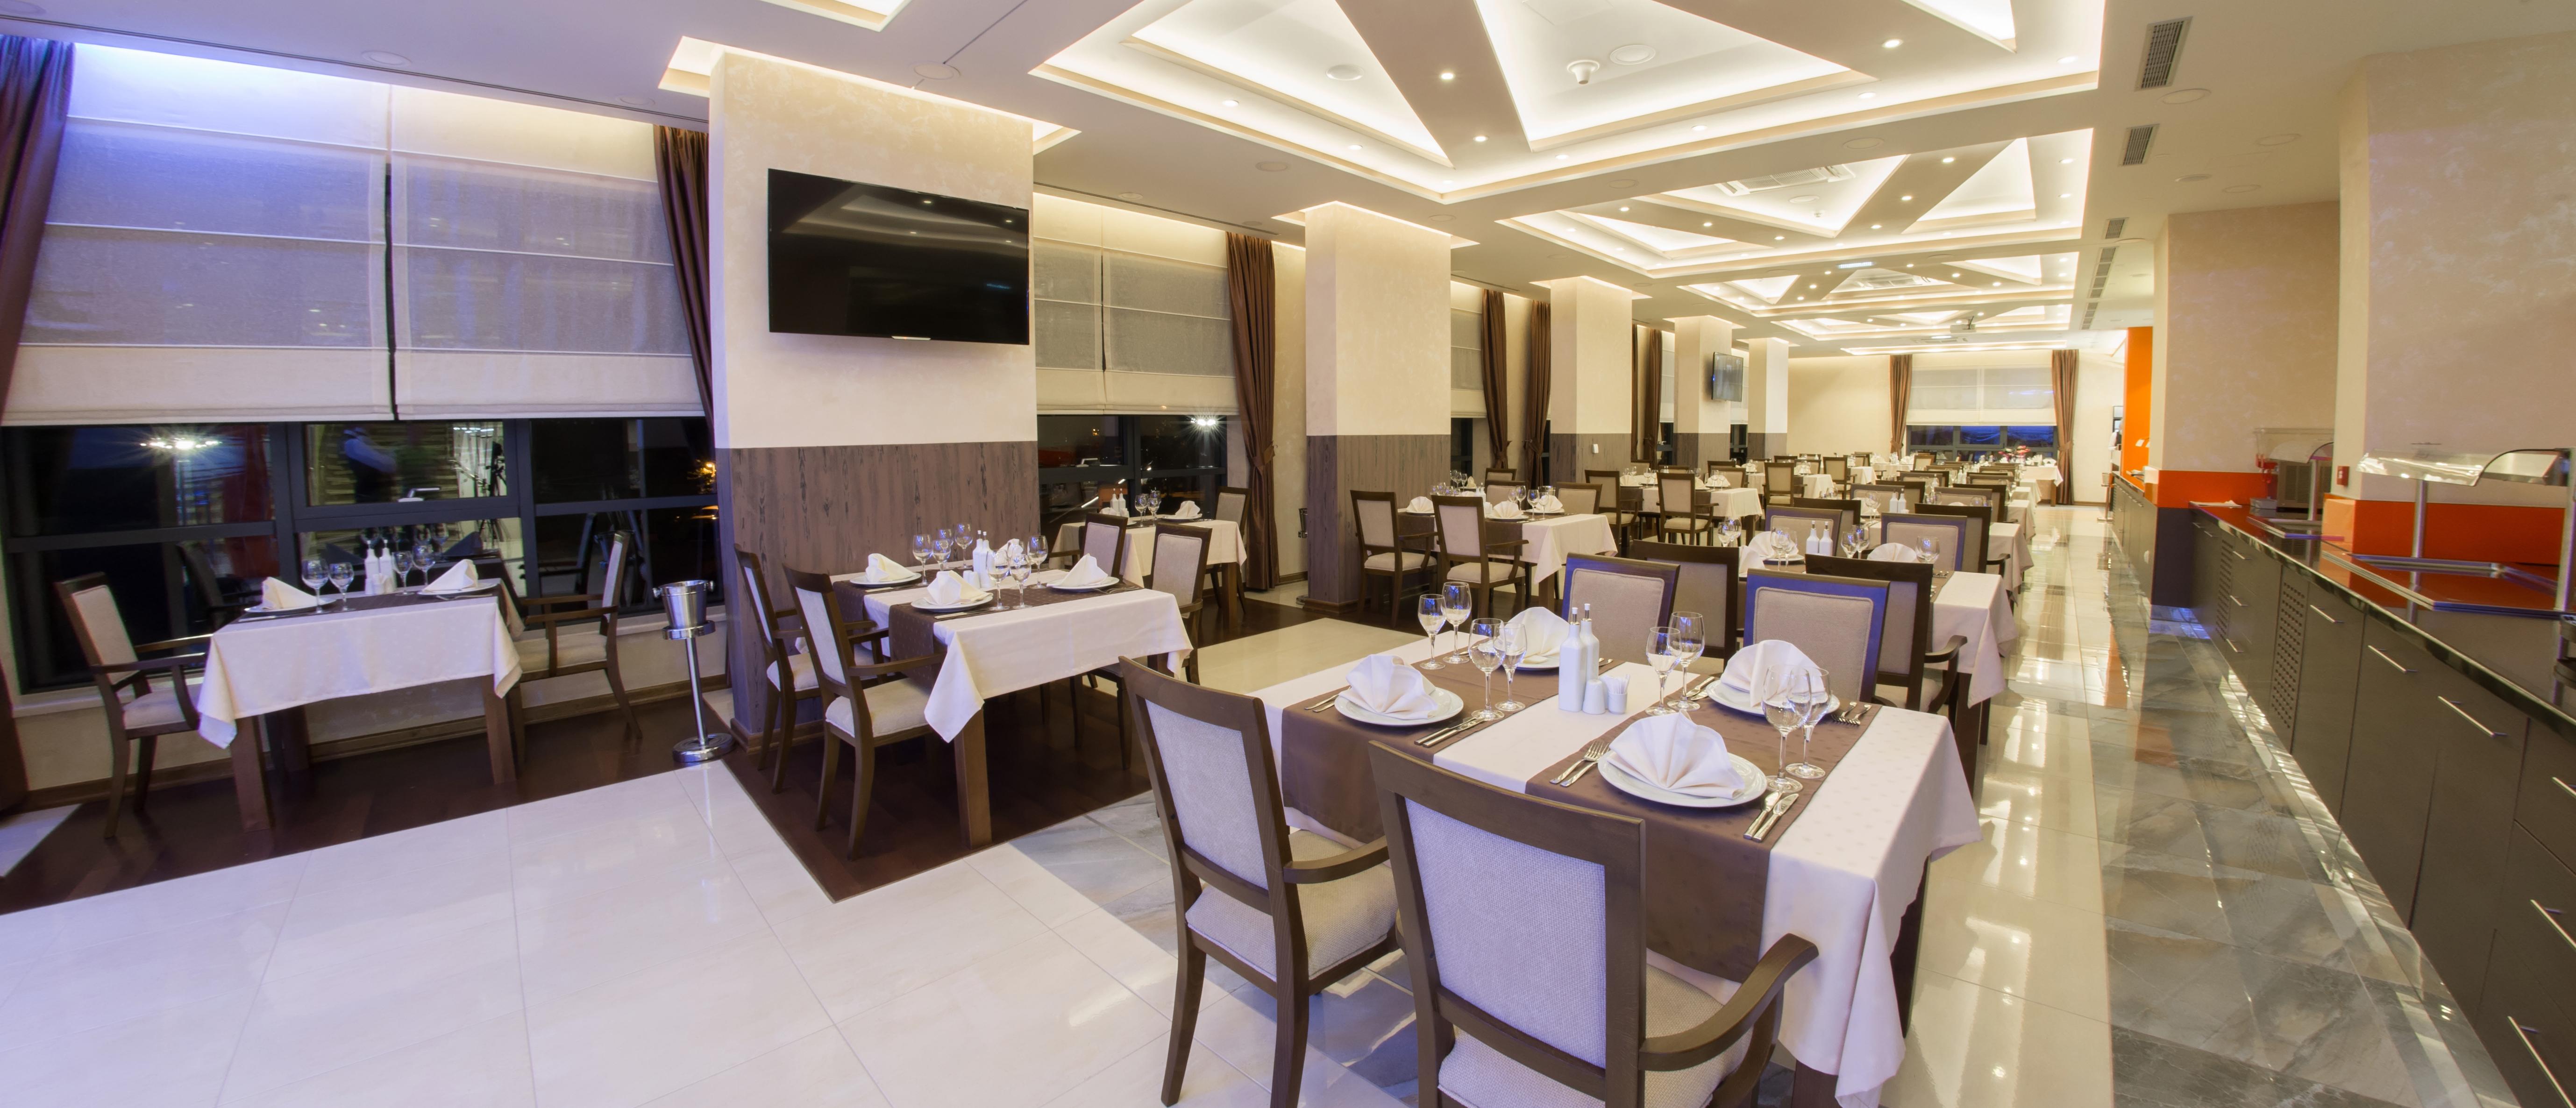 restoran_hotel_mostar